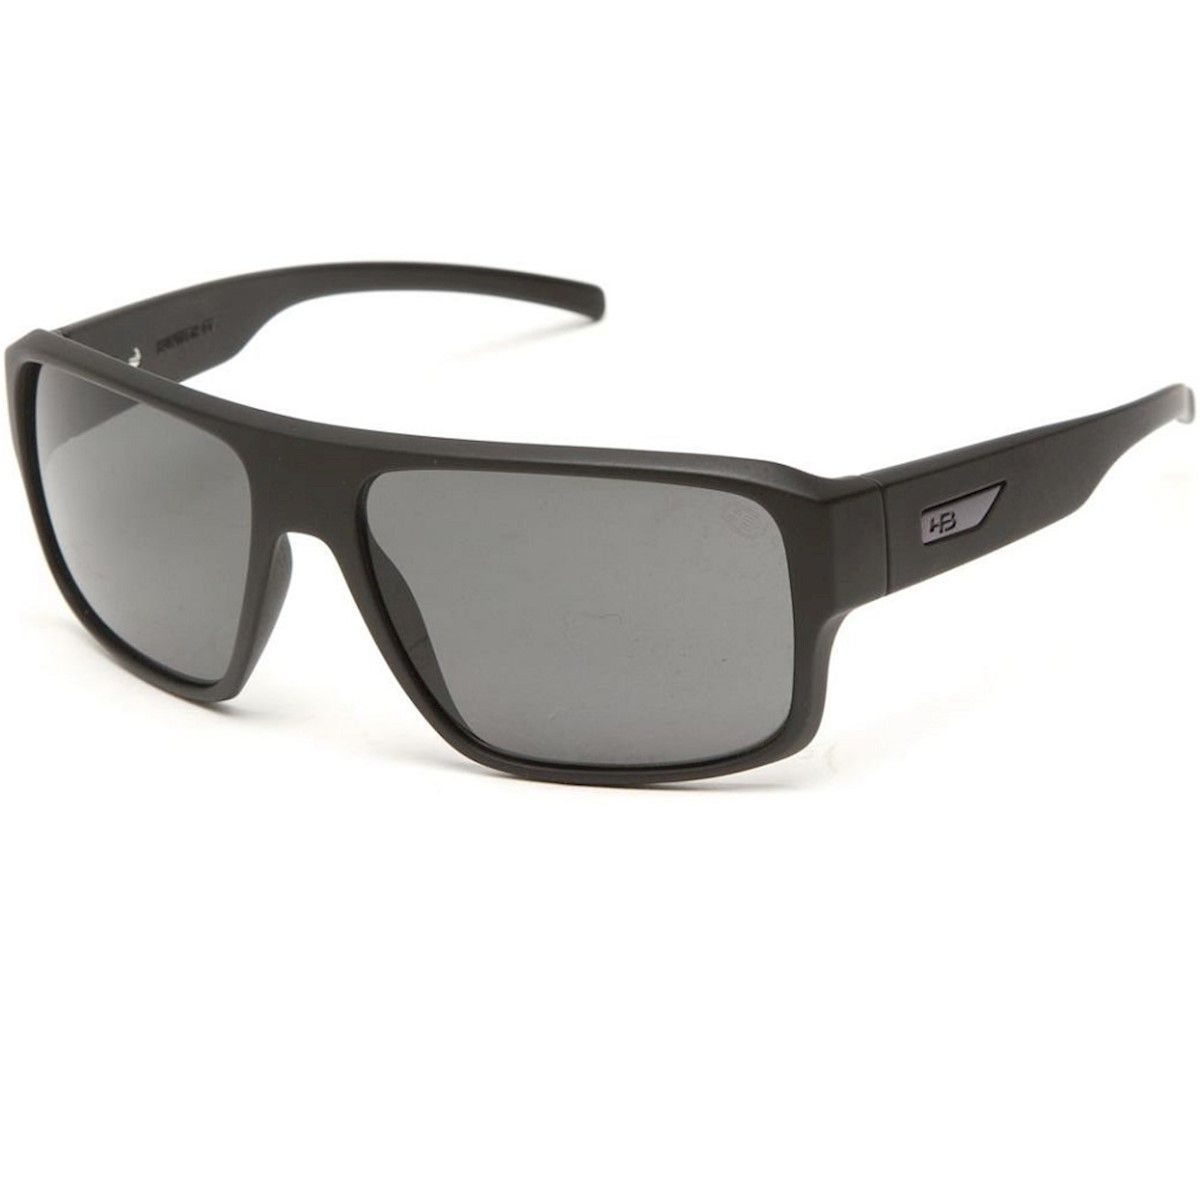 Óculos de Sol HB RedBack Matte Bl/Gray